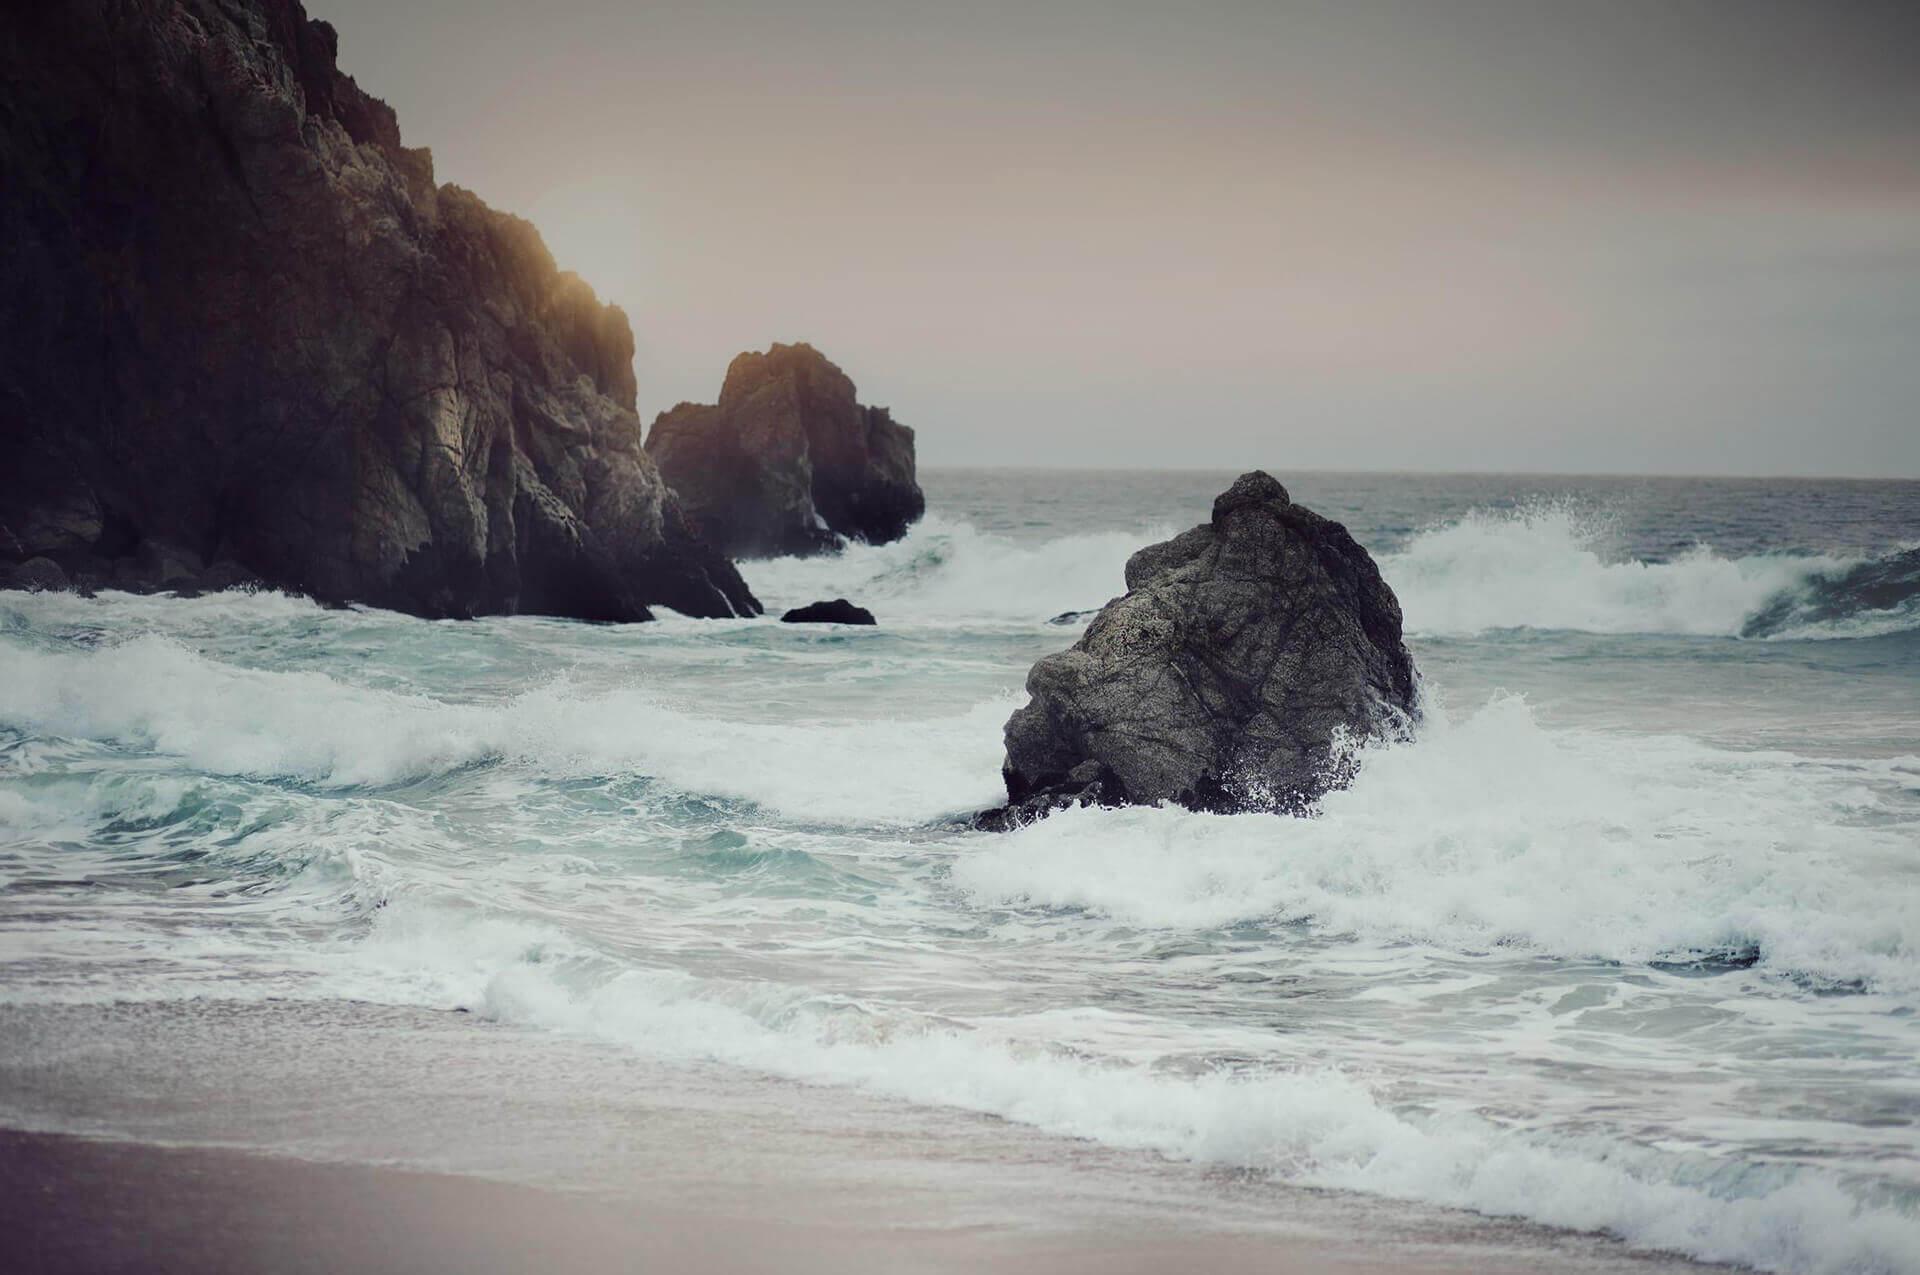 agence kayak communication web lille nord plage rocher mer